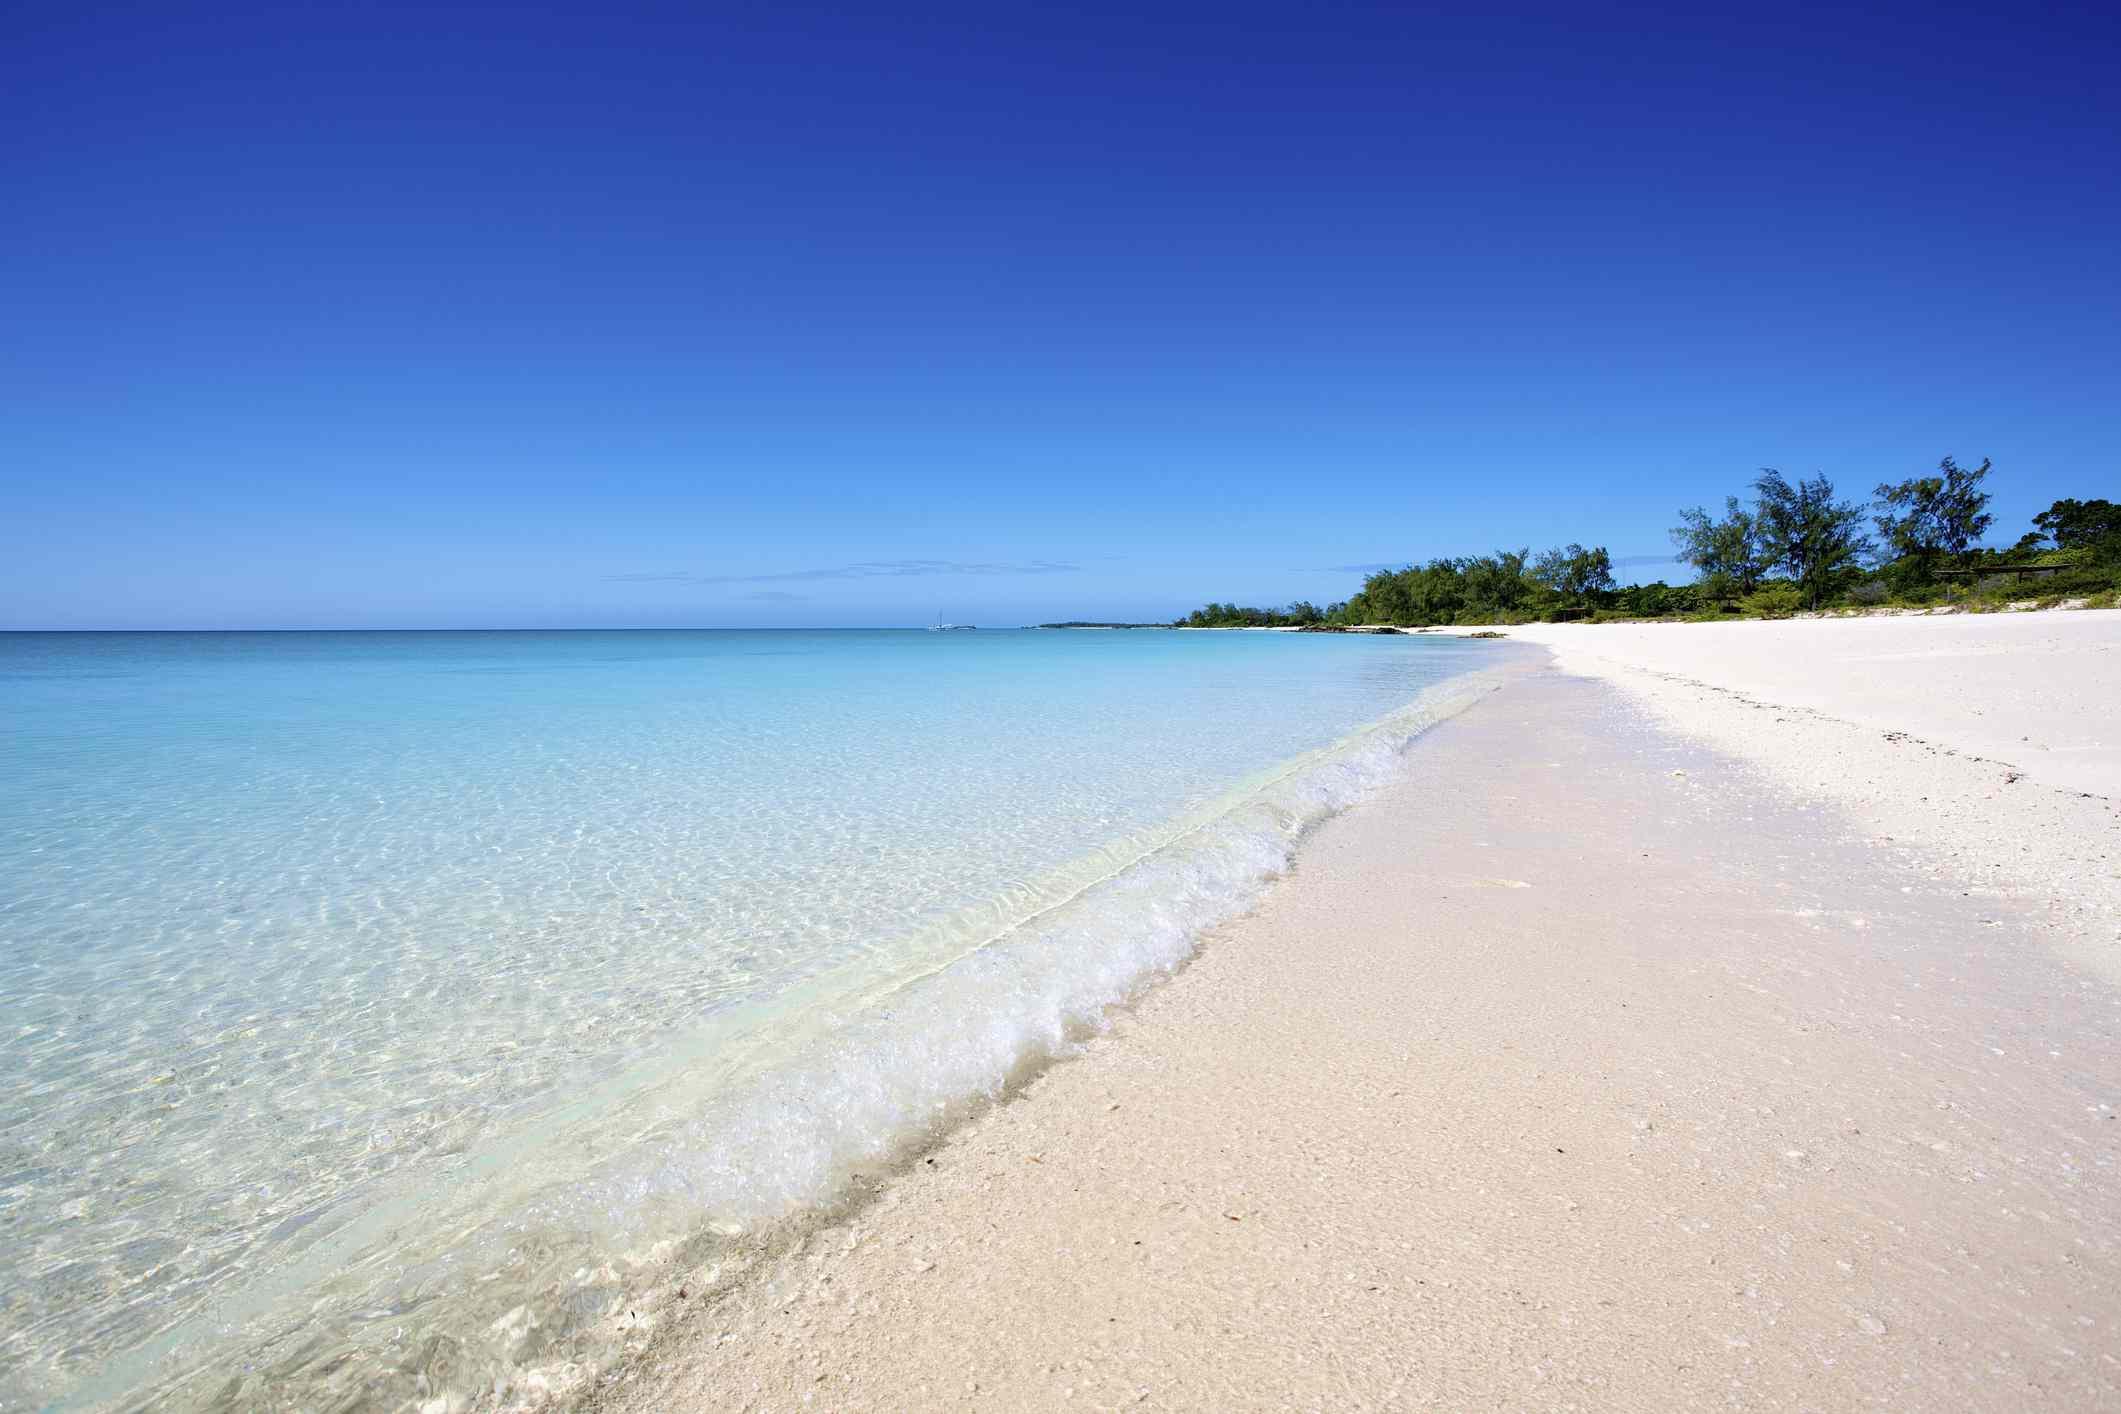 Tropical beach of Vamizi Island, Mozambique